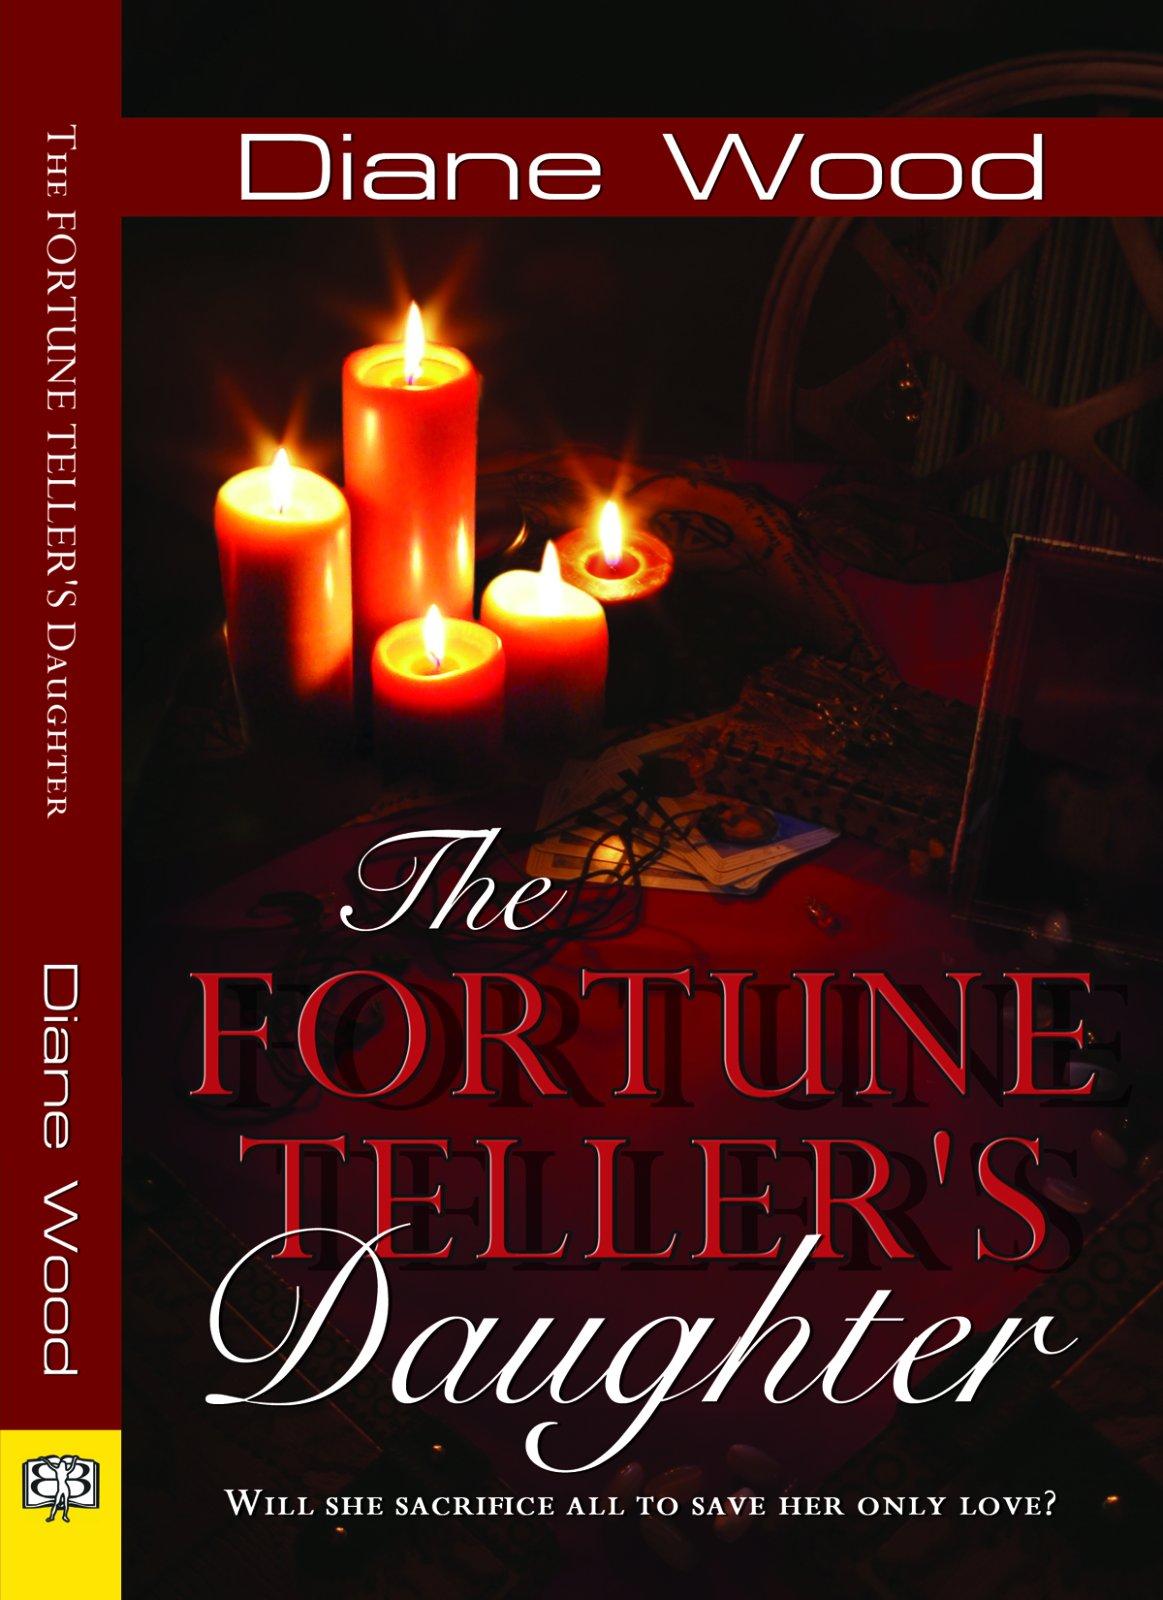 The Fortune Teller's Daughter: Diane Wood: 9781594933936